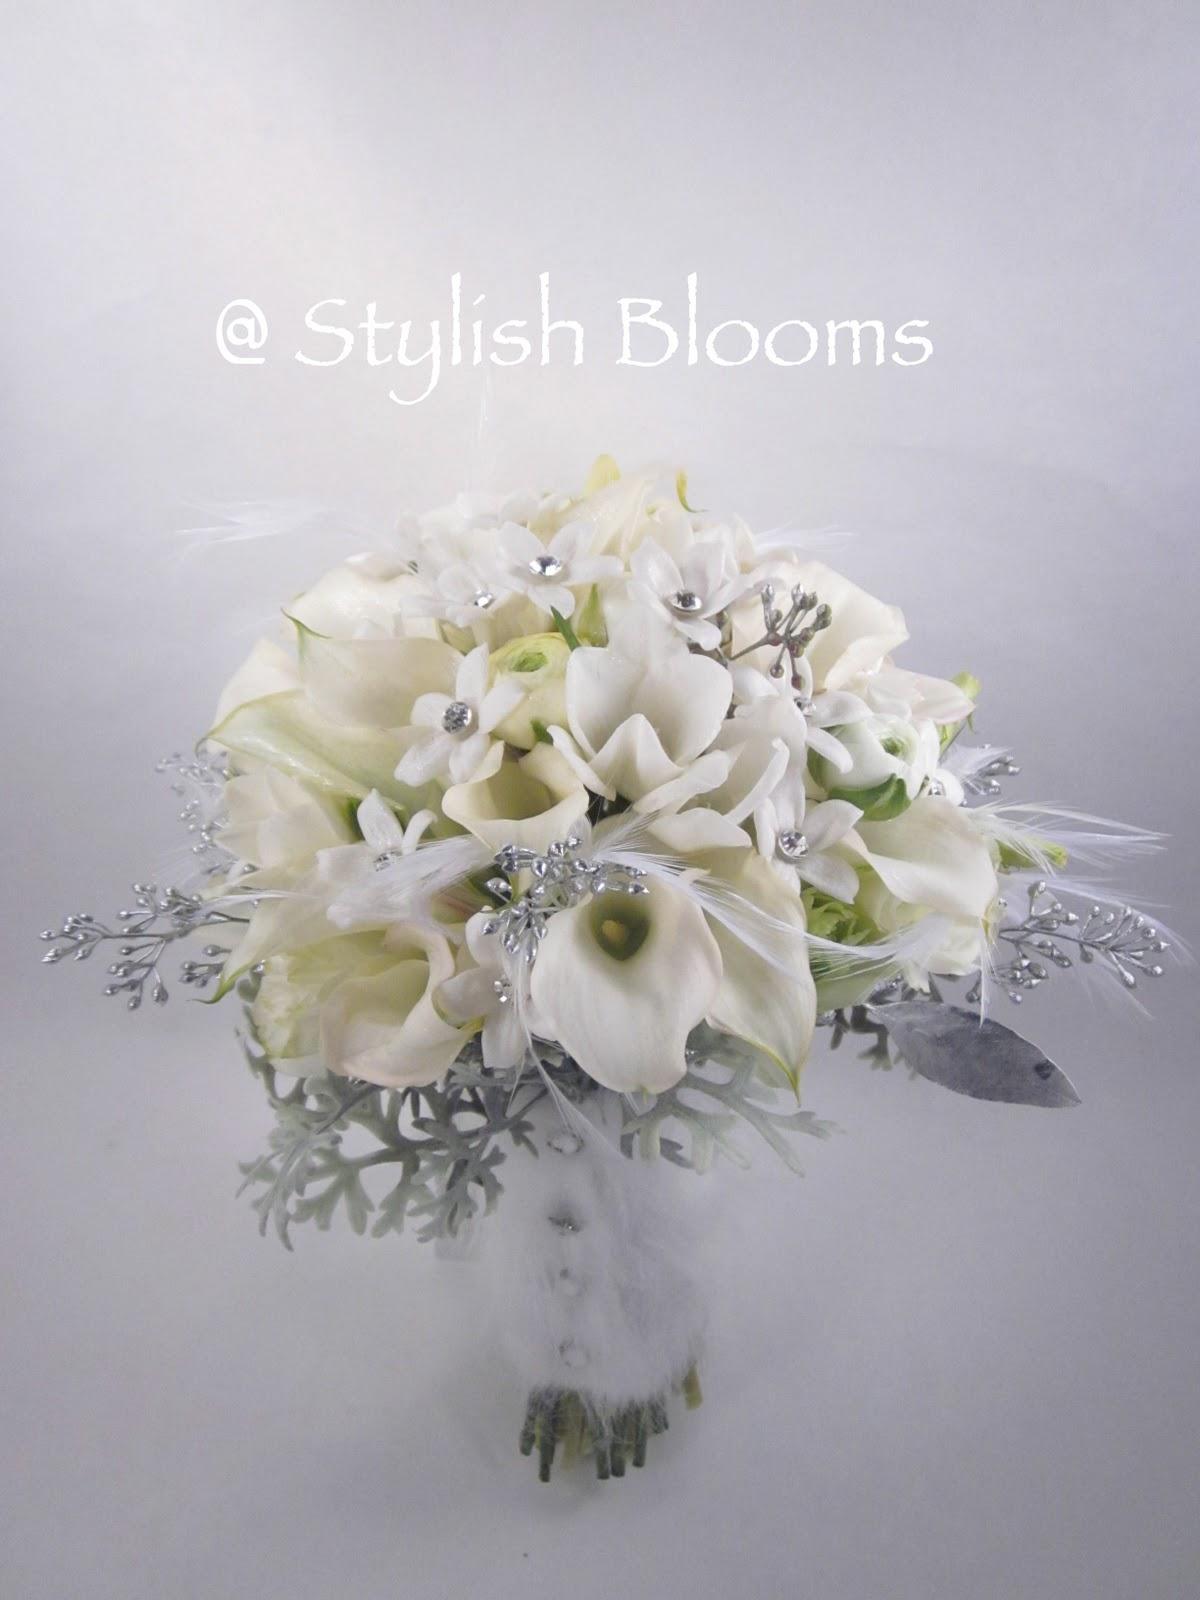 stylish blooms winter wedding. Black Bedroom Furniture Sets. Home Design Ideas